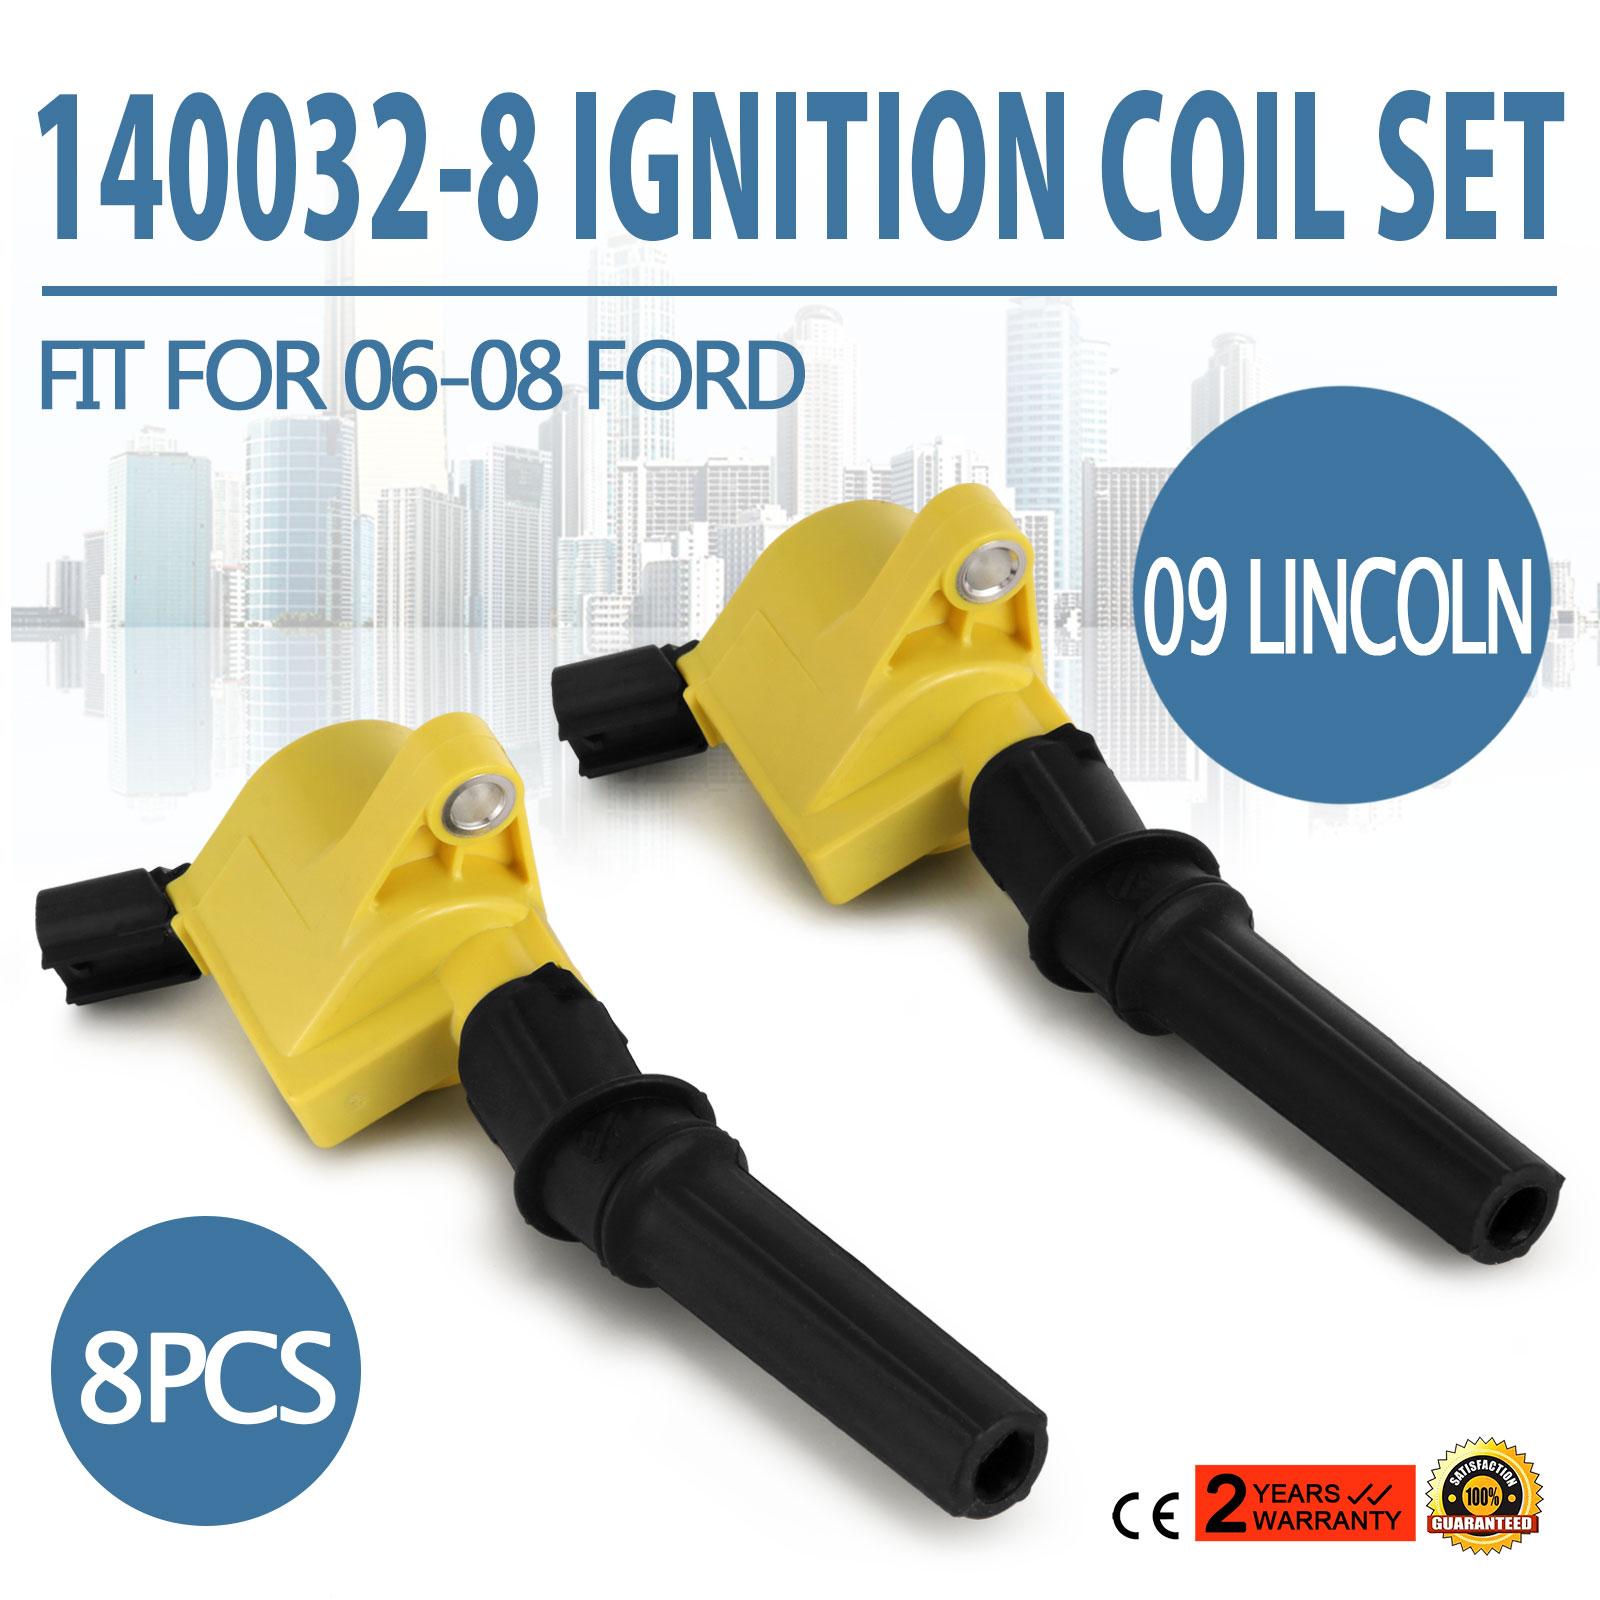 Accel 140032-8 Super Coil Ignition Coil Set 1998-2008 Ford 4.6//5.4 2-valve